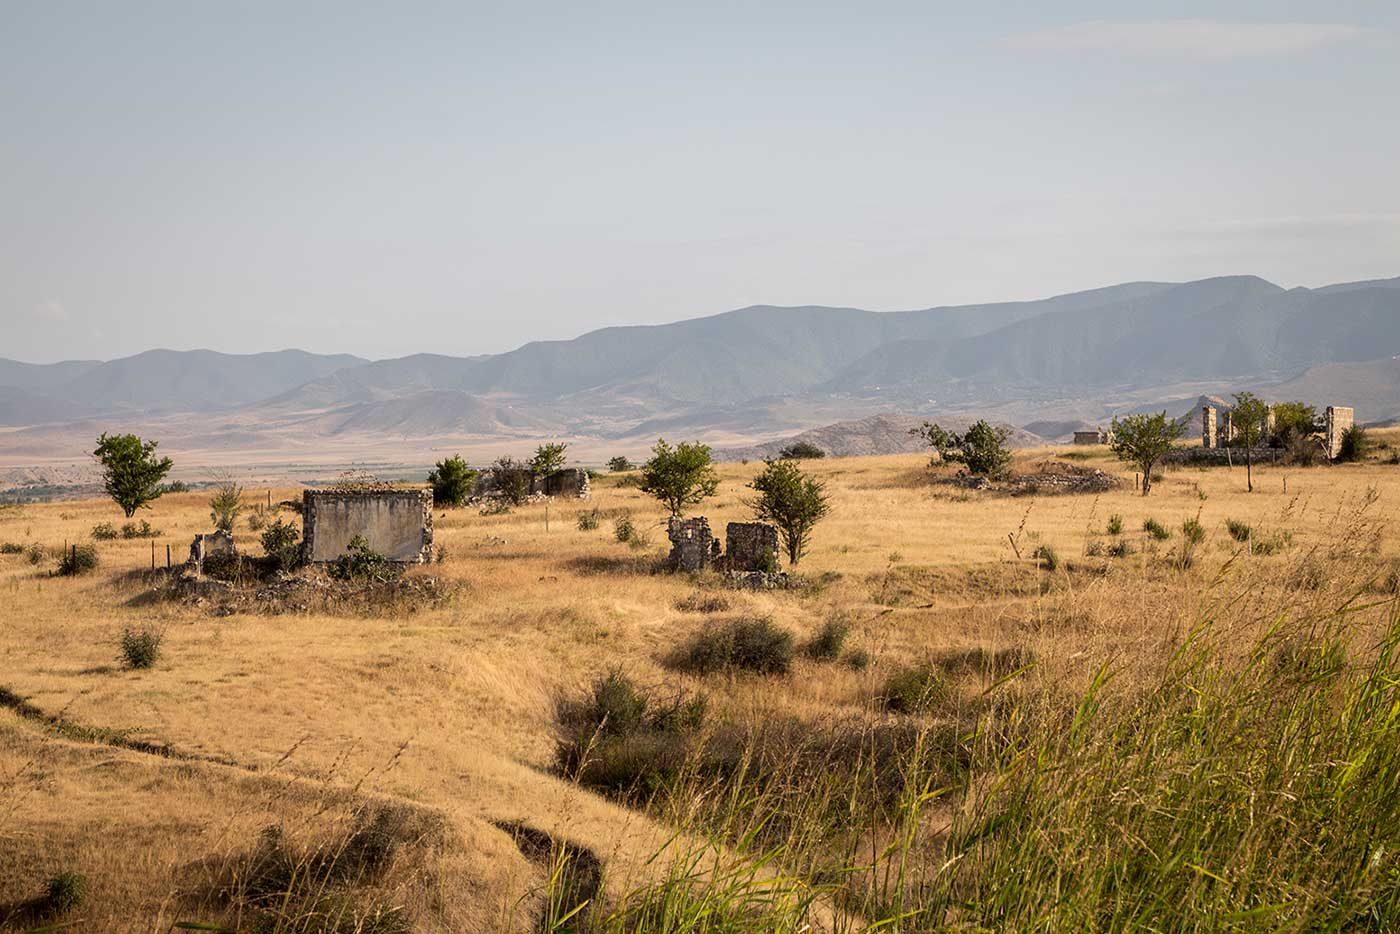 Agdam, Nagorno-Karabakh (Artsakh Republic).